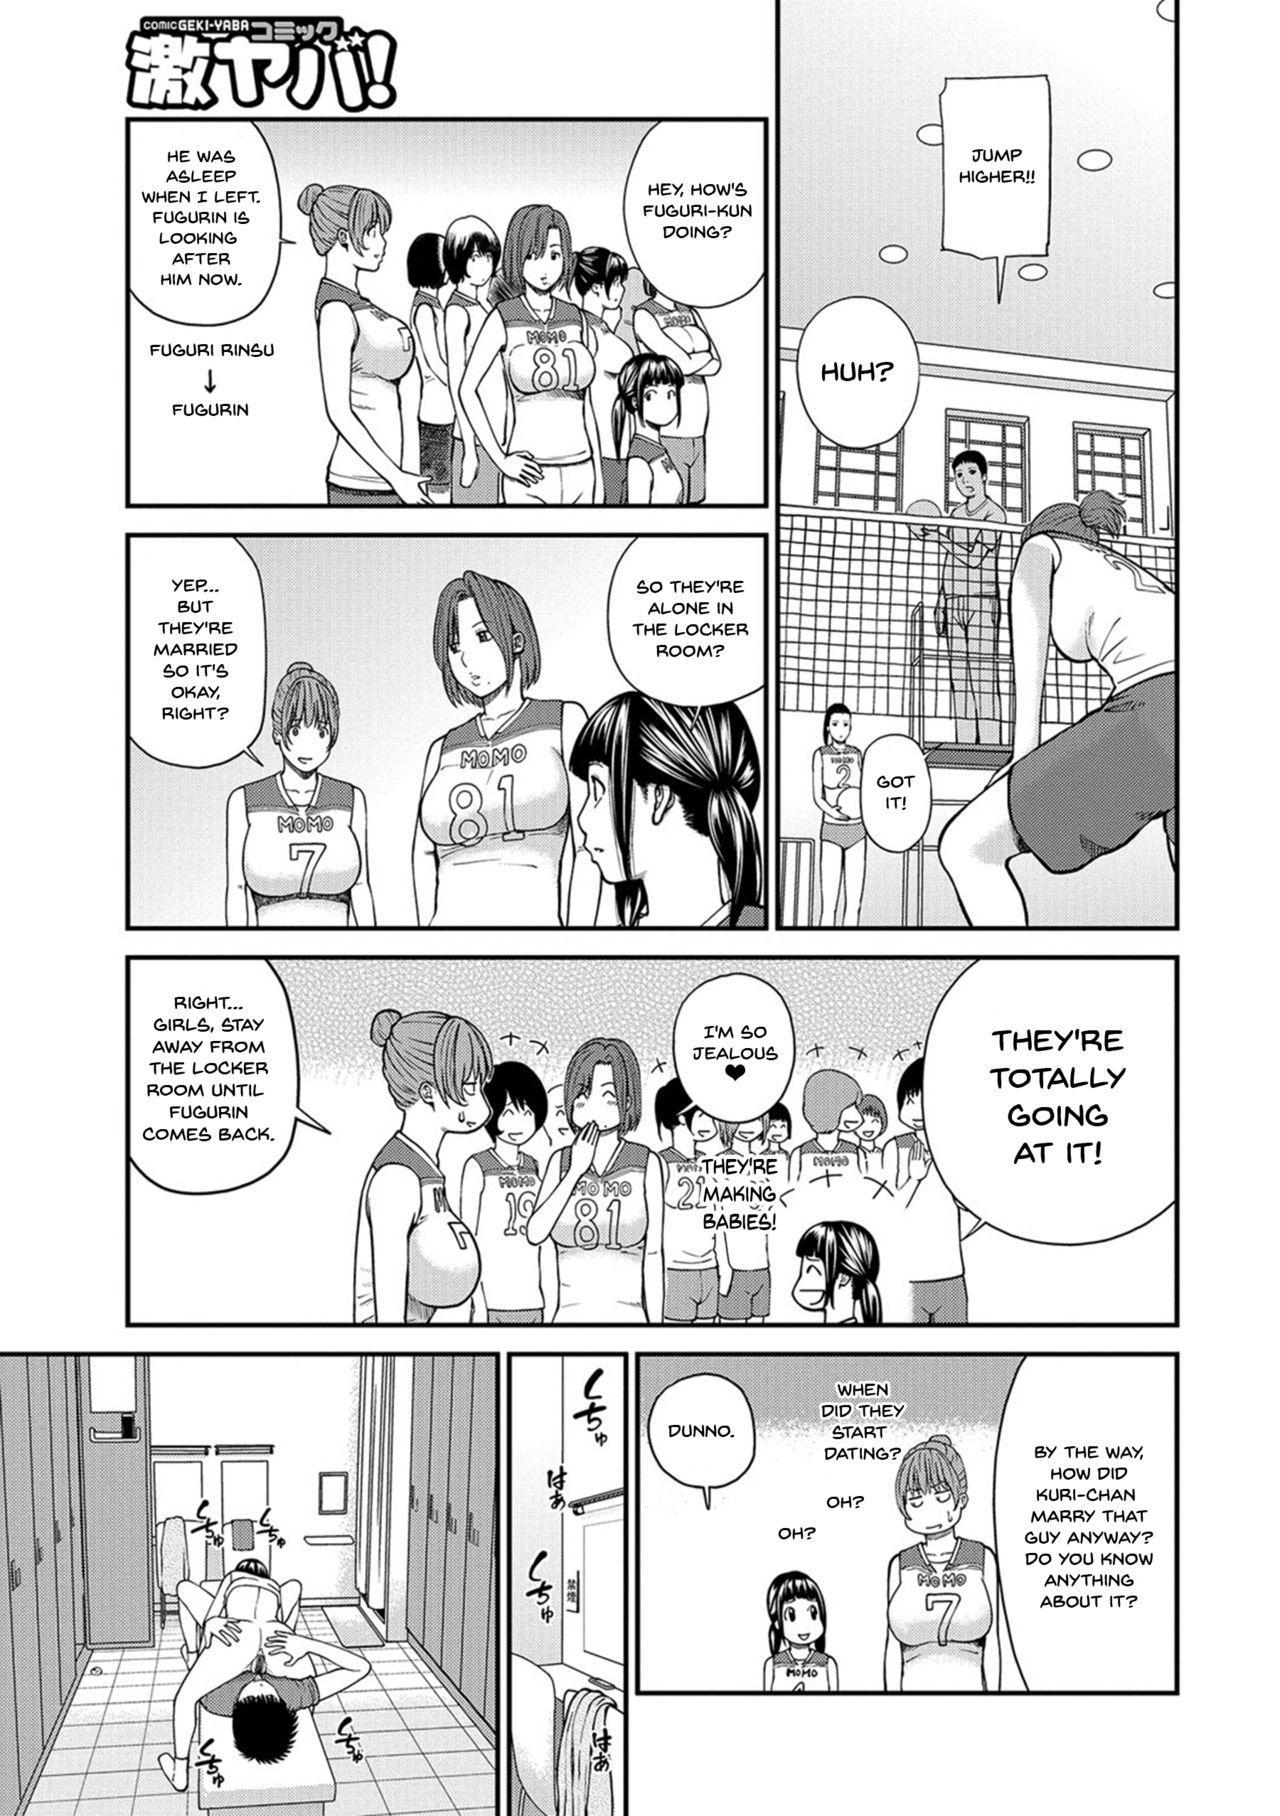 [Kuroki Hidehiko] Momojiri Danchi Mama-san Volley Doukoukai - Mom's Volley Ball | Momojiri District Mature Women's Volleyball Club Ch.1-9 [English] {Doujins.com} [Digital] 145